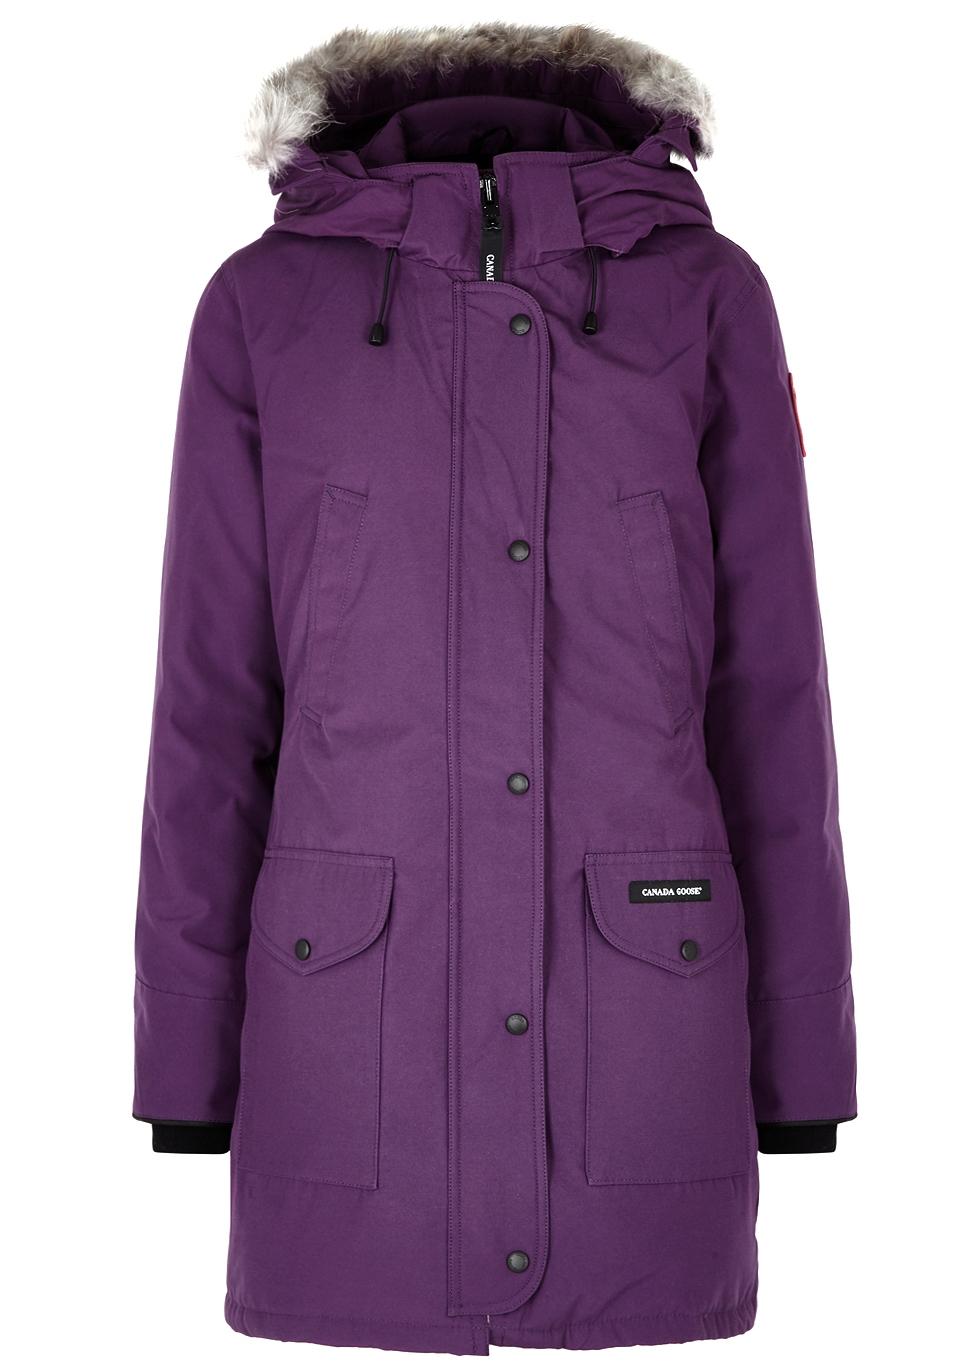 canada goose trillium purple fur trimmed parka harvey nichols rh harveynichols com